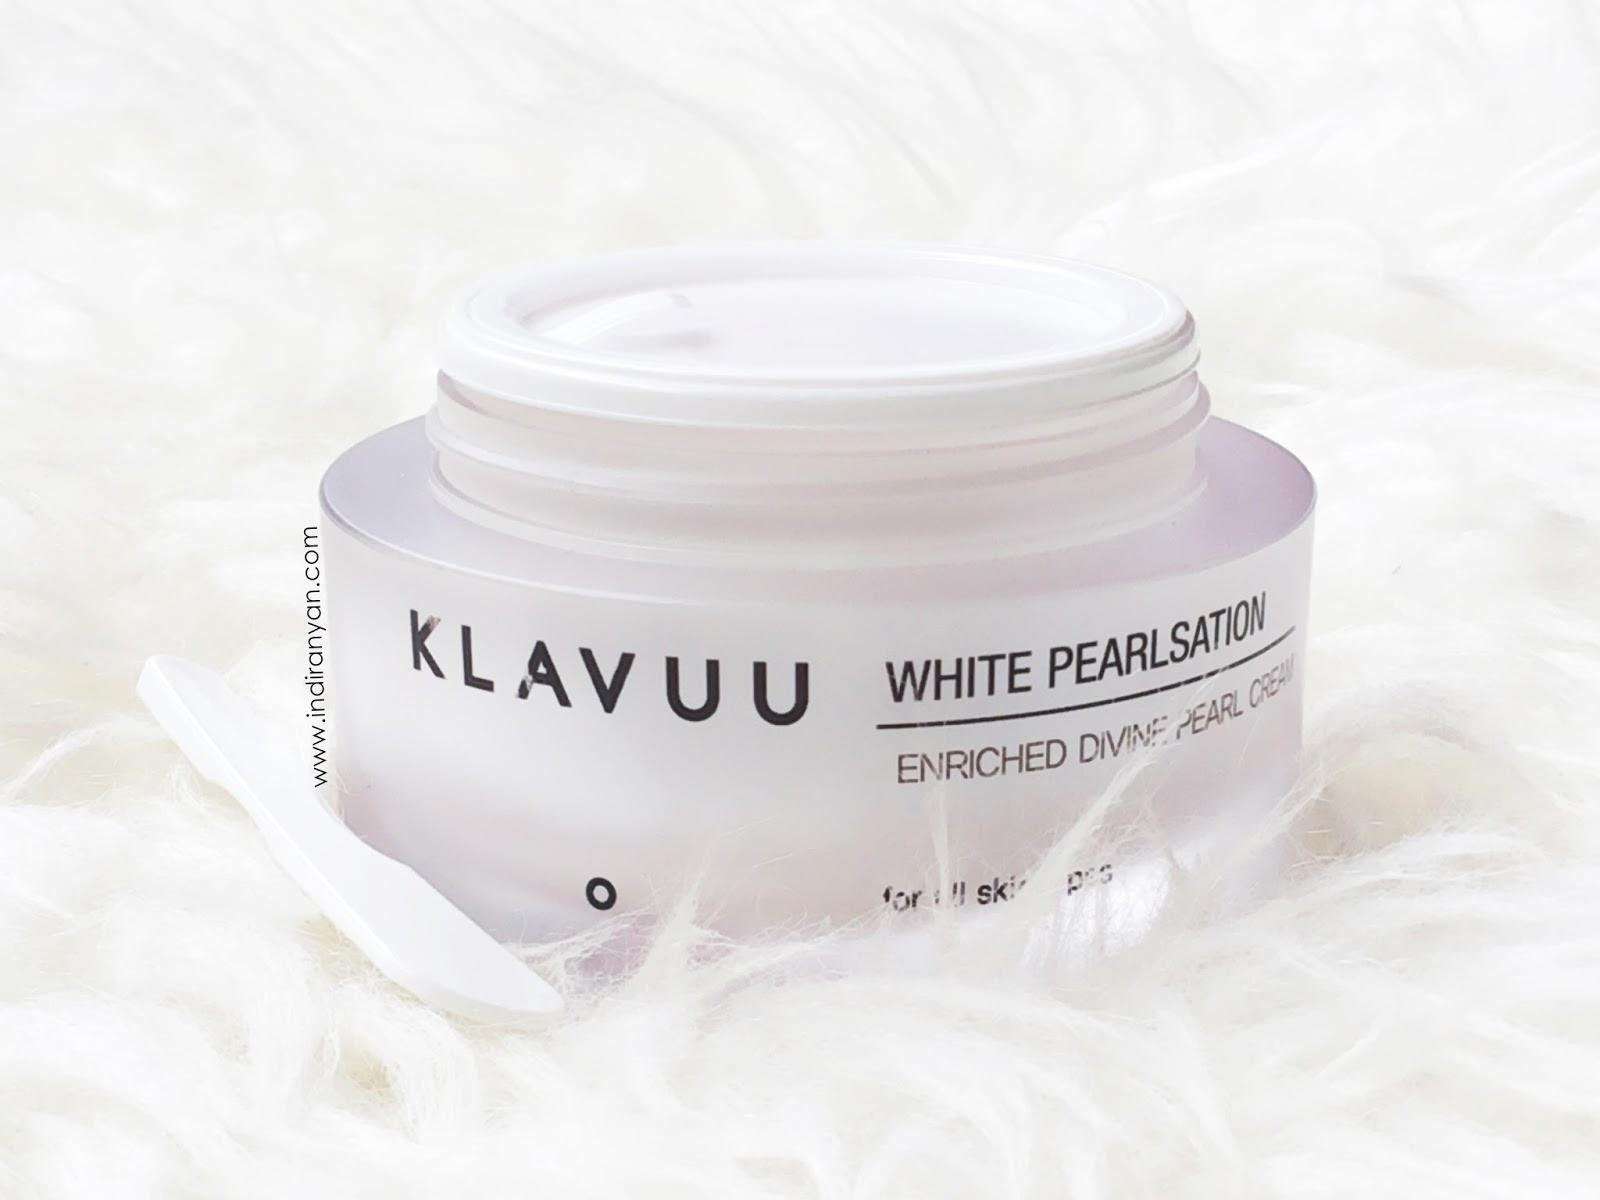 klavuu-white-pearlsation-enriched-divine-pearl-cream-packaging